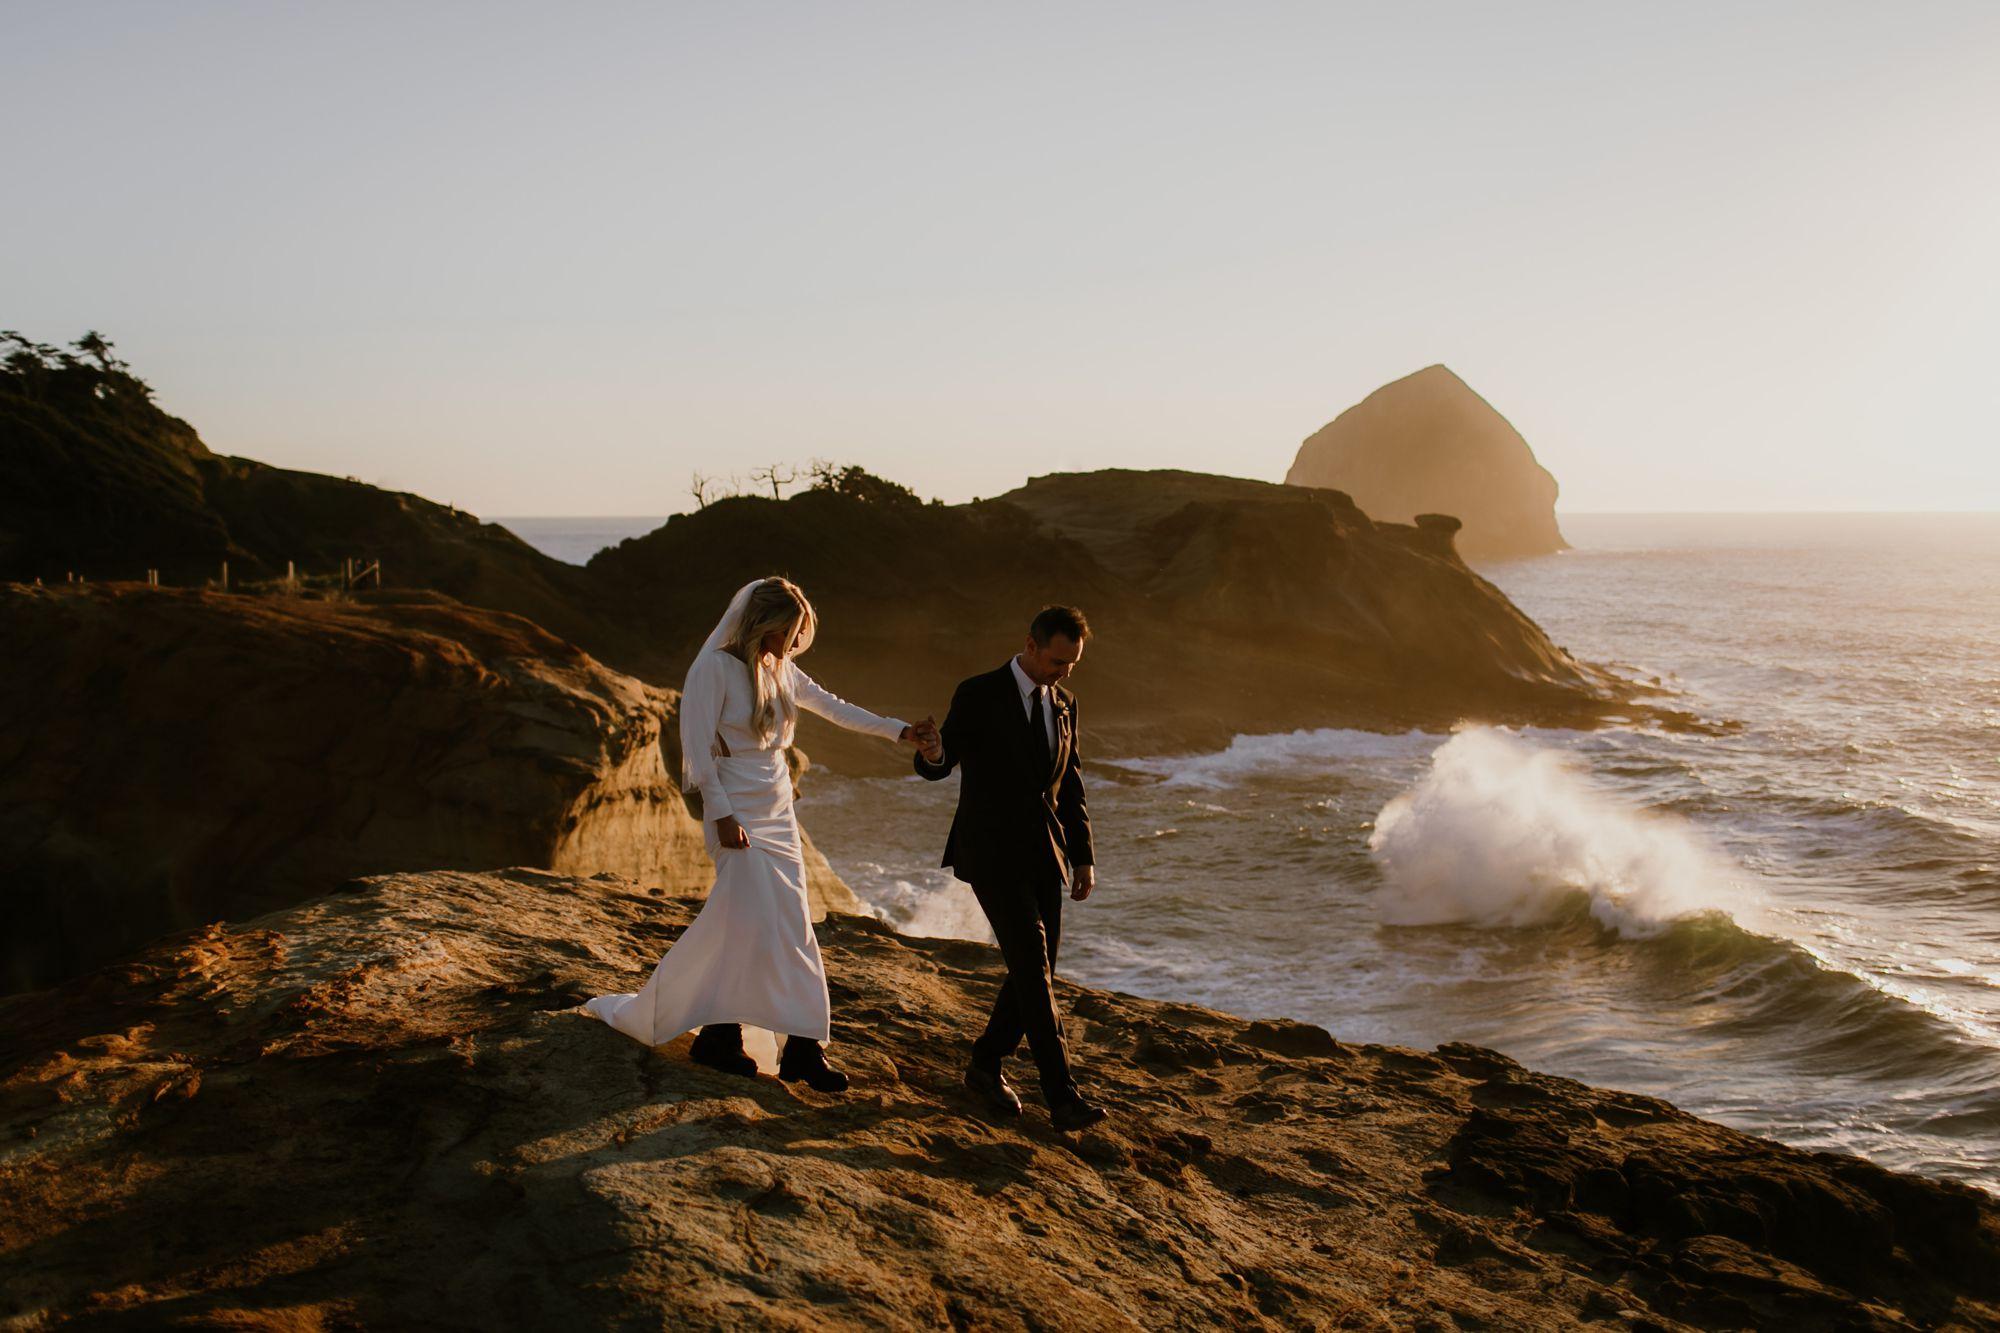 Oregon coast wedding photo at Cape Kiwanda